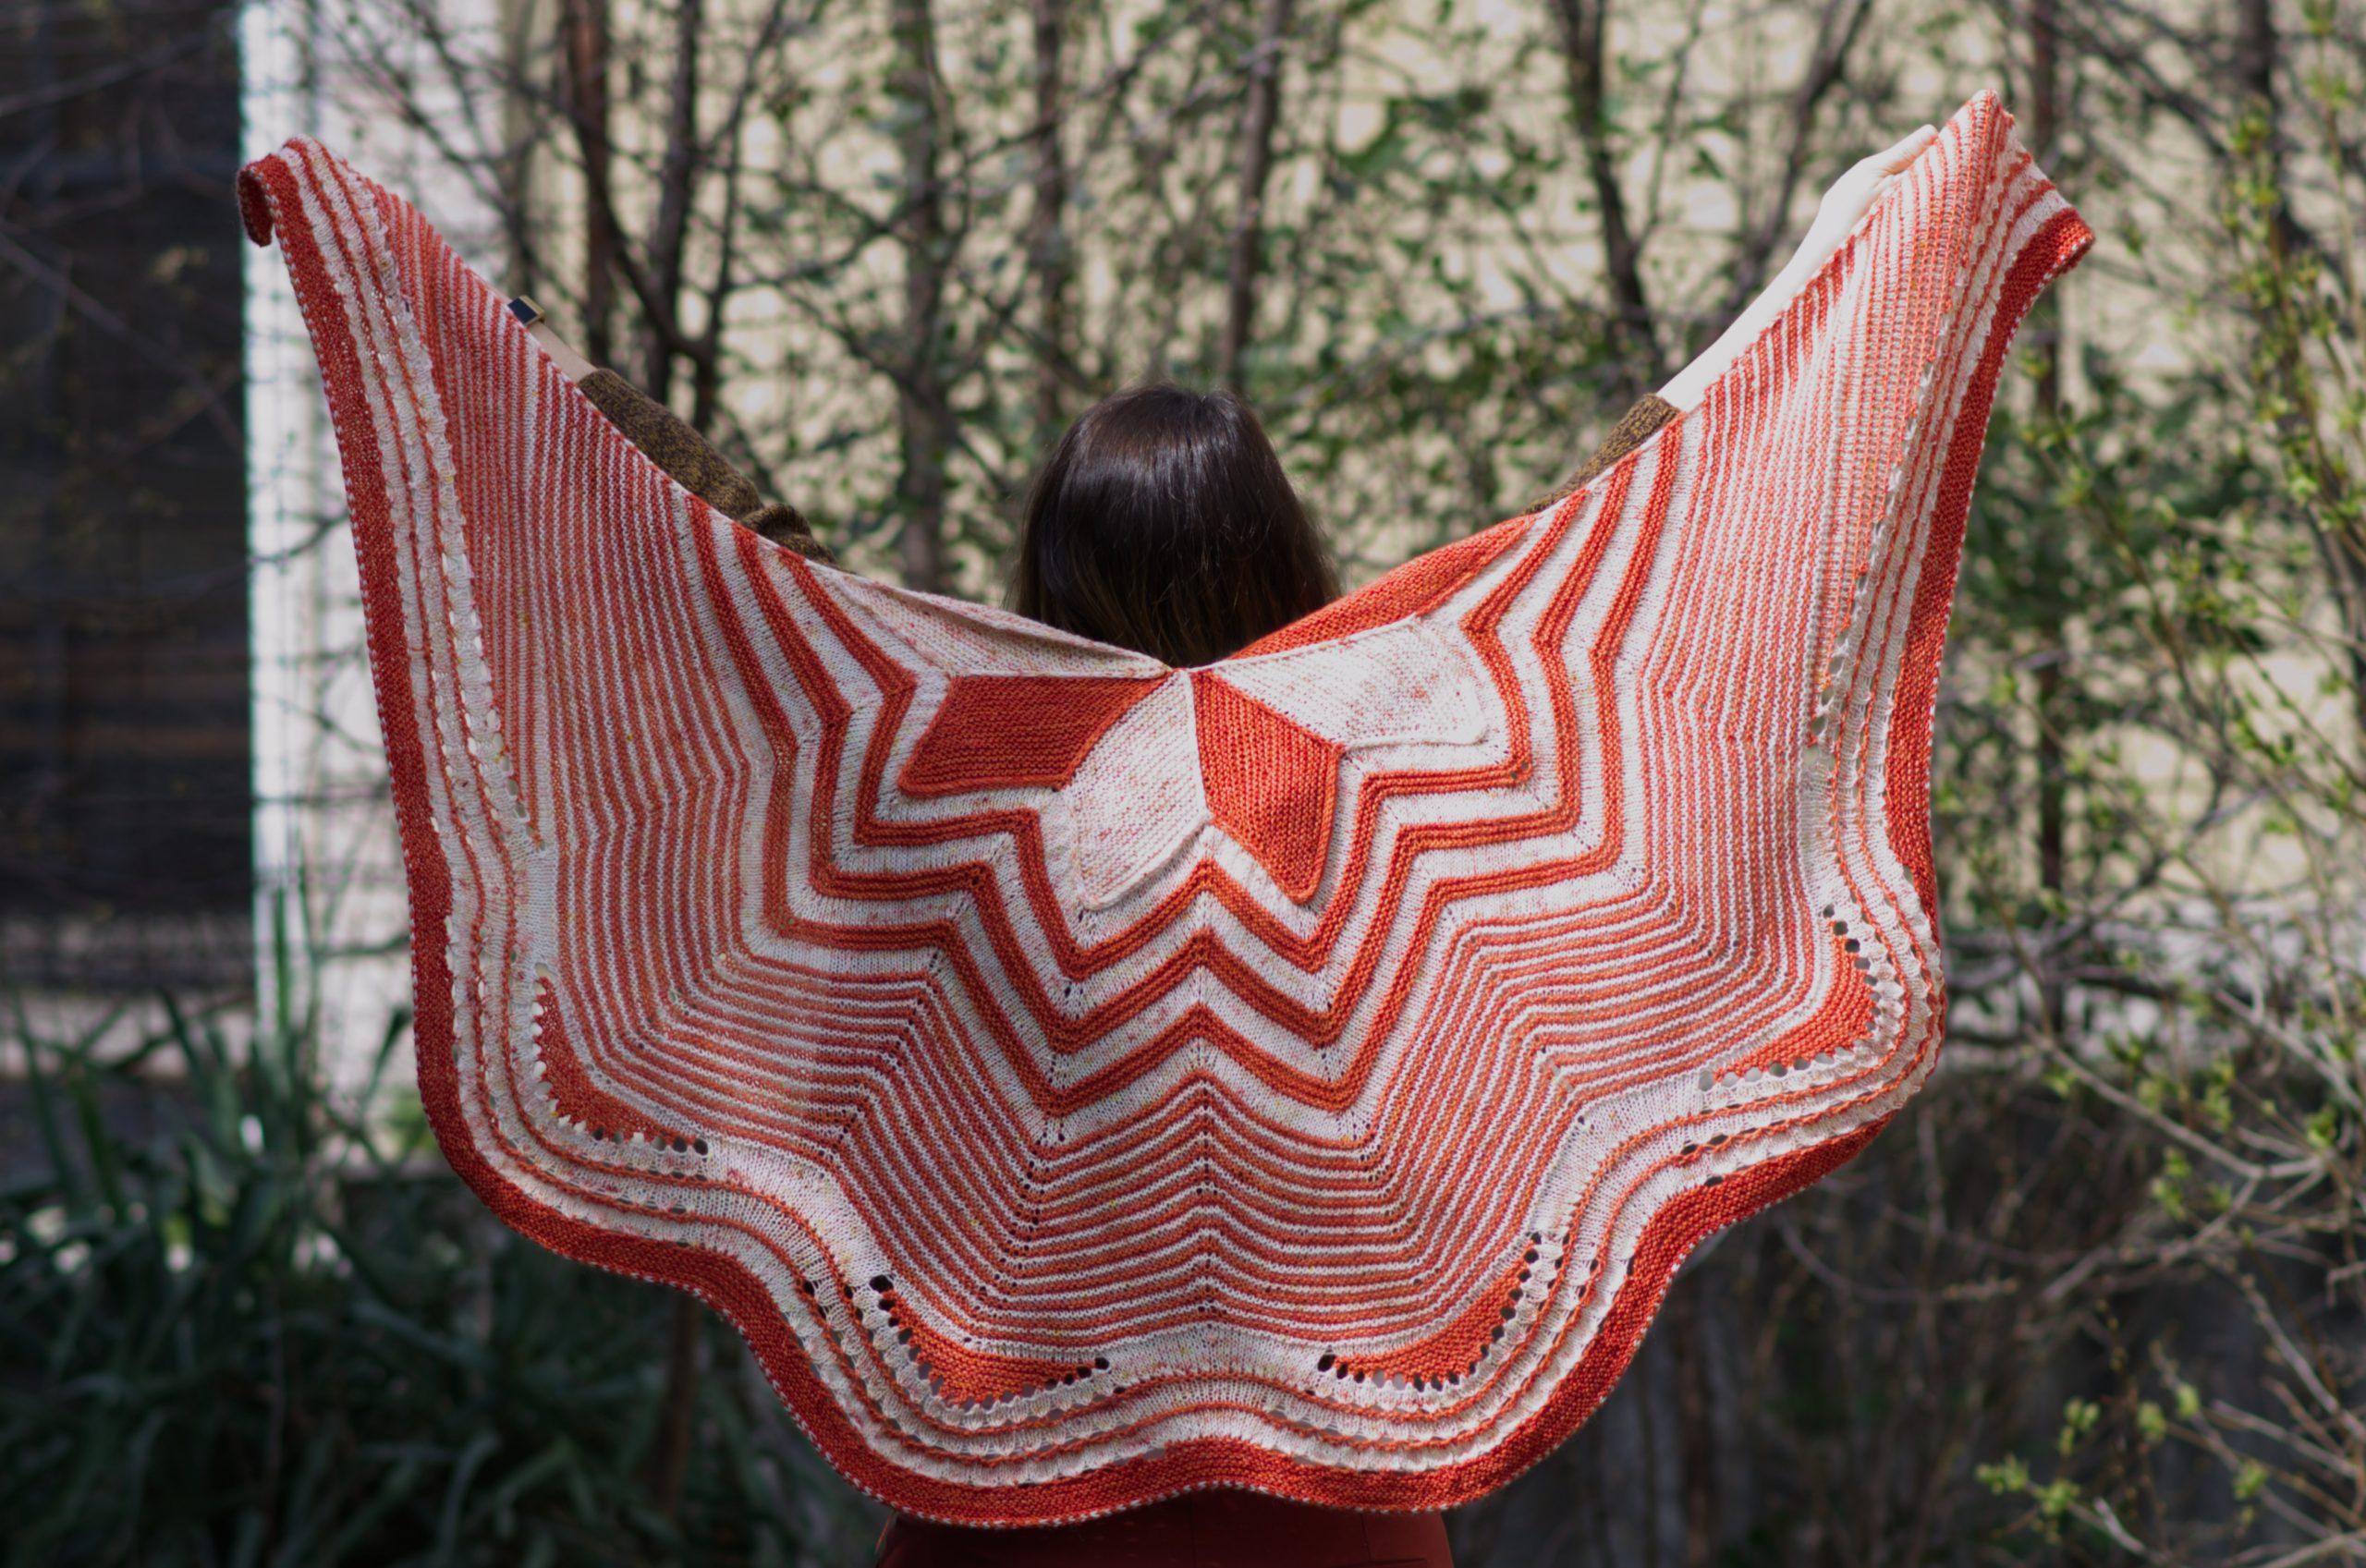 Starflake shawl by Stephen West